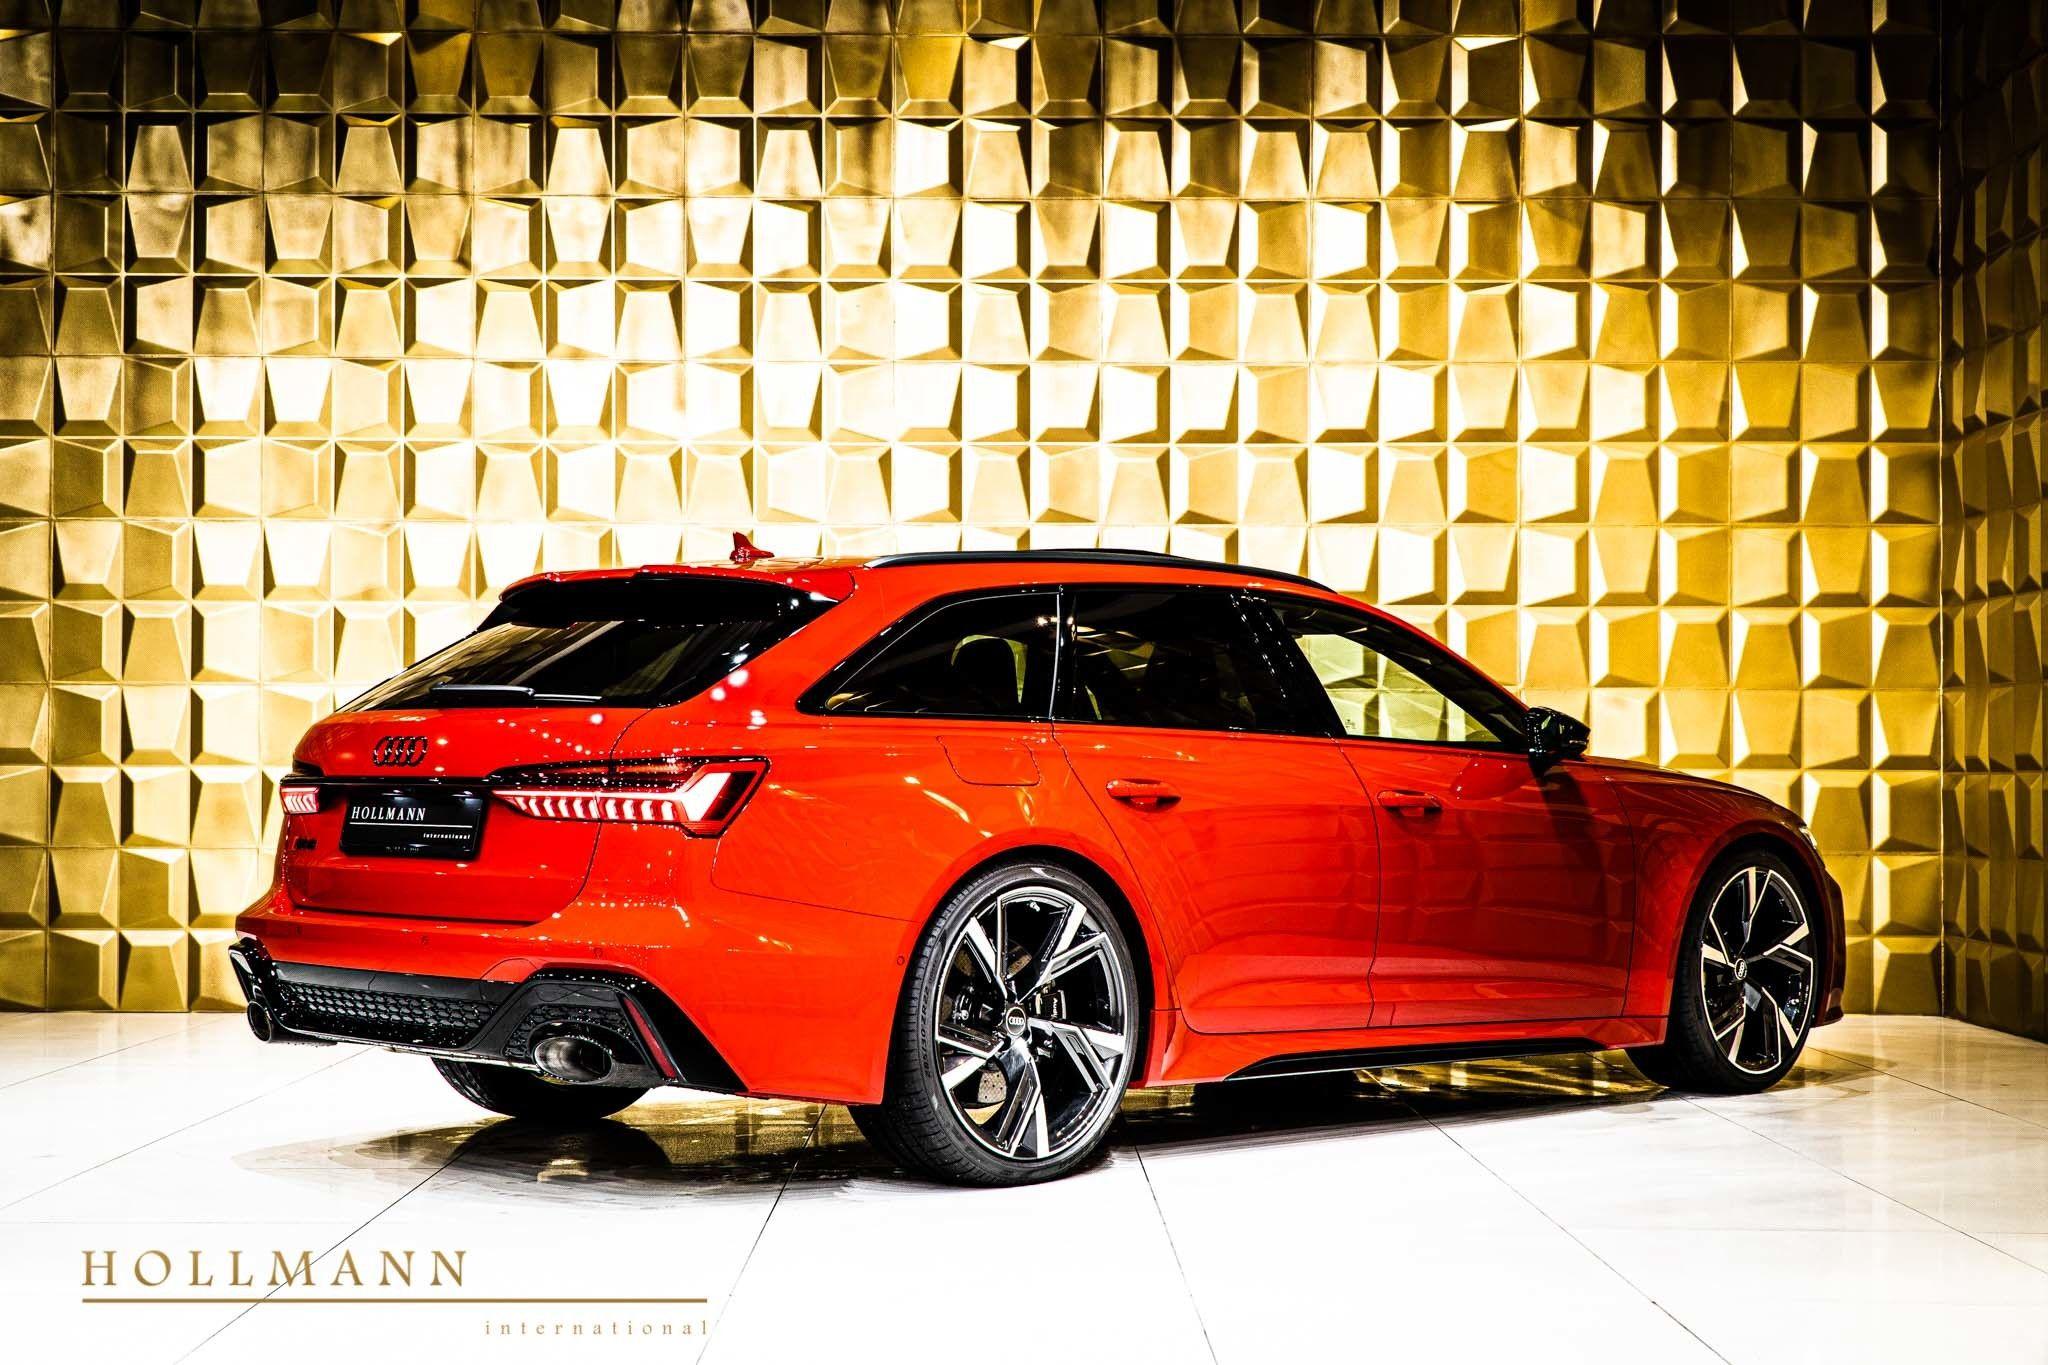 Audi Rs6 Avant Hollmann International Germany For Sale On Luxurypulse In 2020 Audi Rs6 Audi Rs Audi